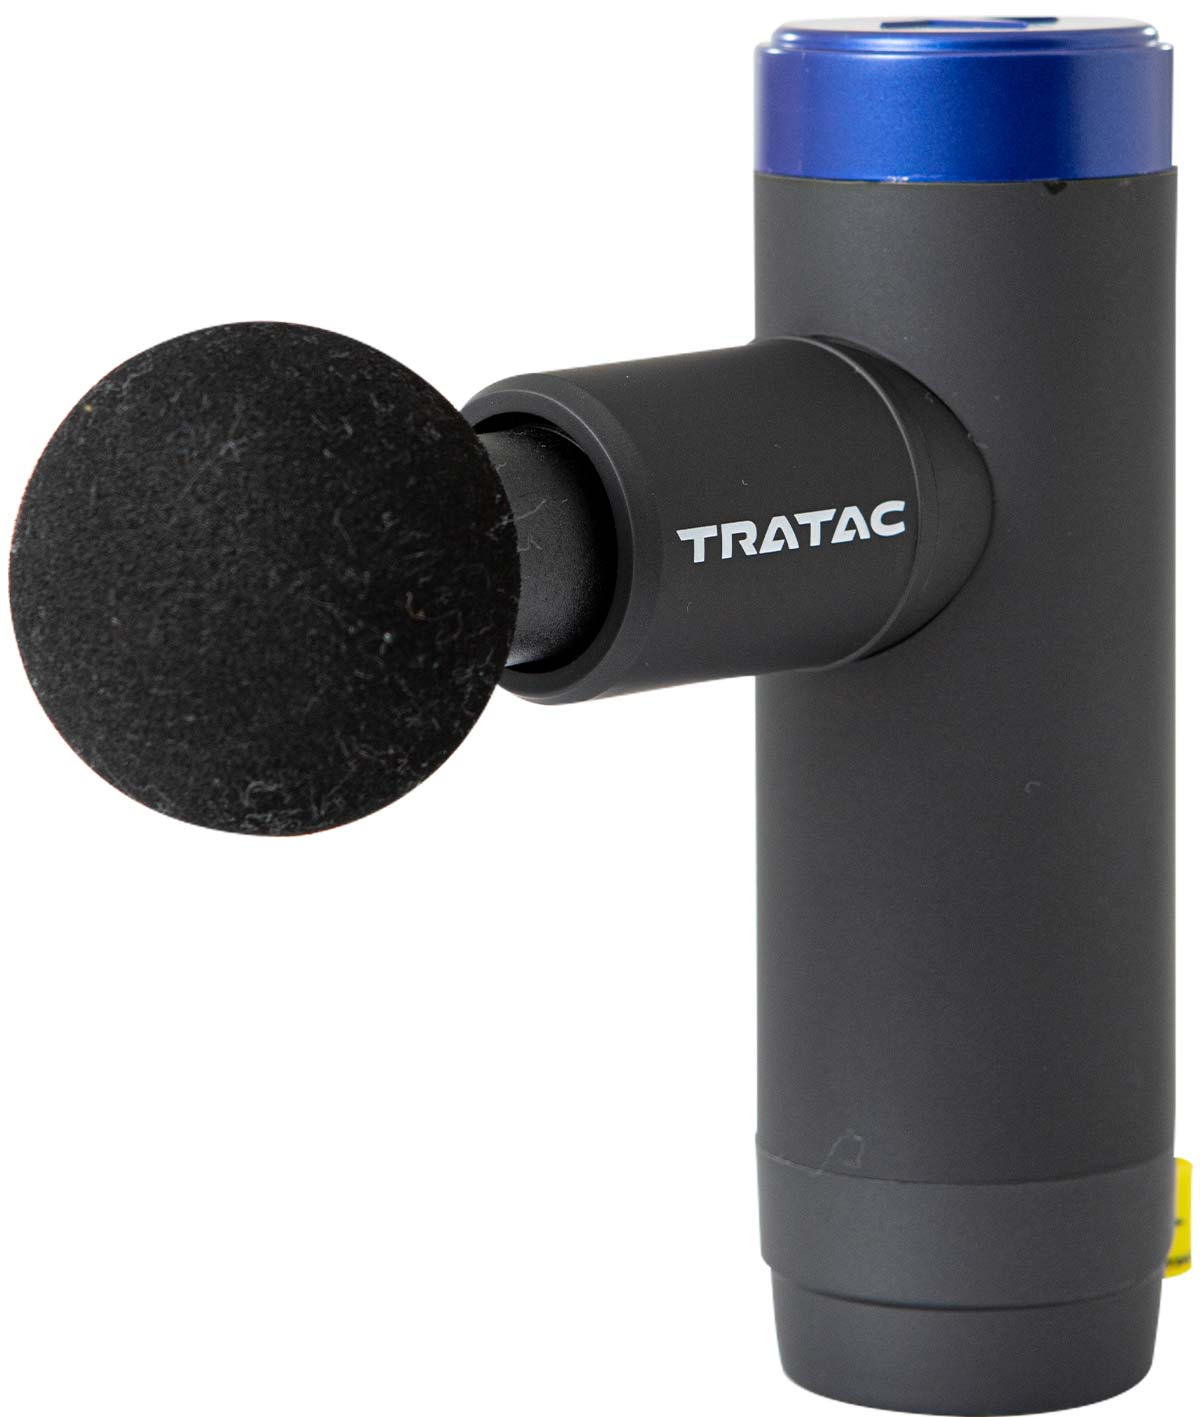 Tratac ActiveGun Pod אקדח עיסוי קומפקטי בצבע אפורתמונה של